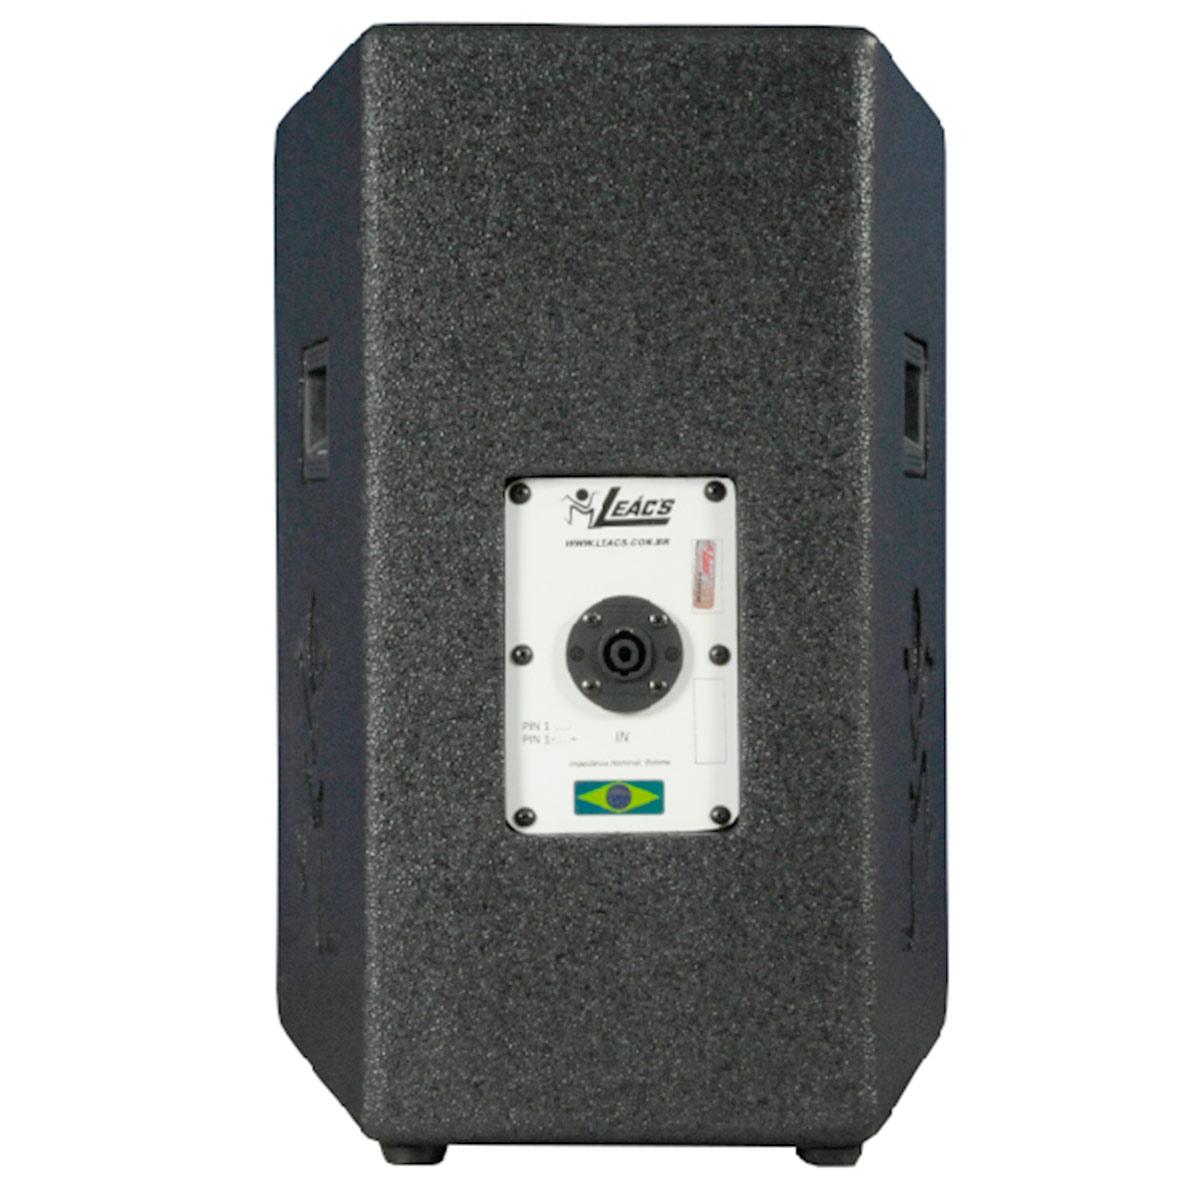 Caixa Passiva Fal 12 Pol 250W - VIP 400 Leacs